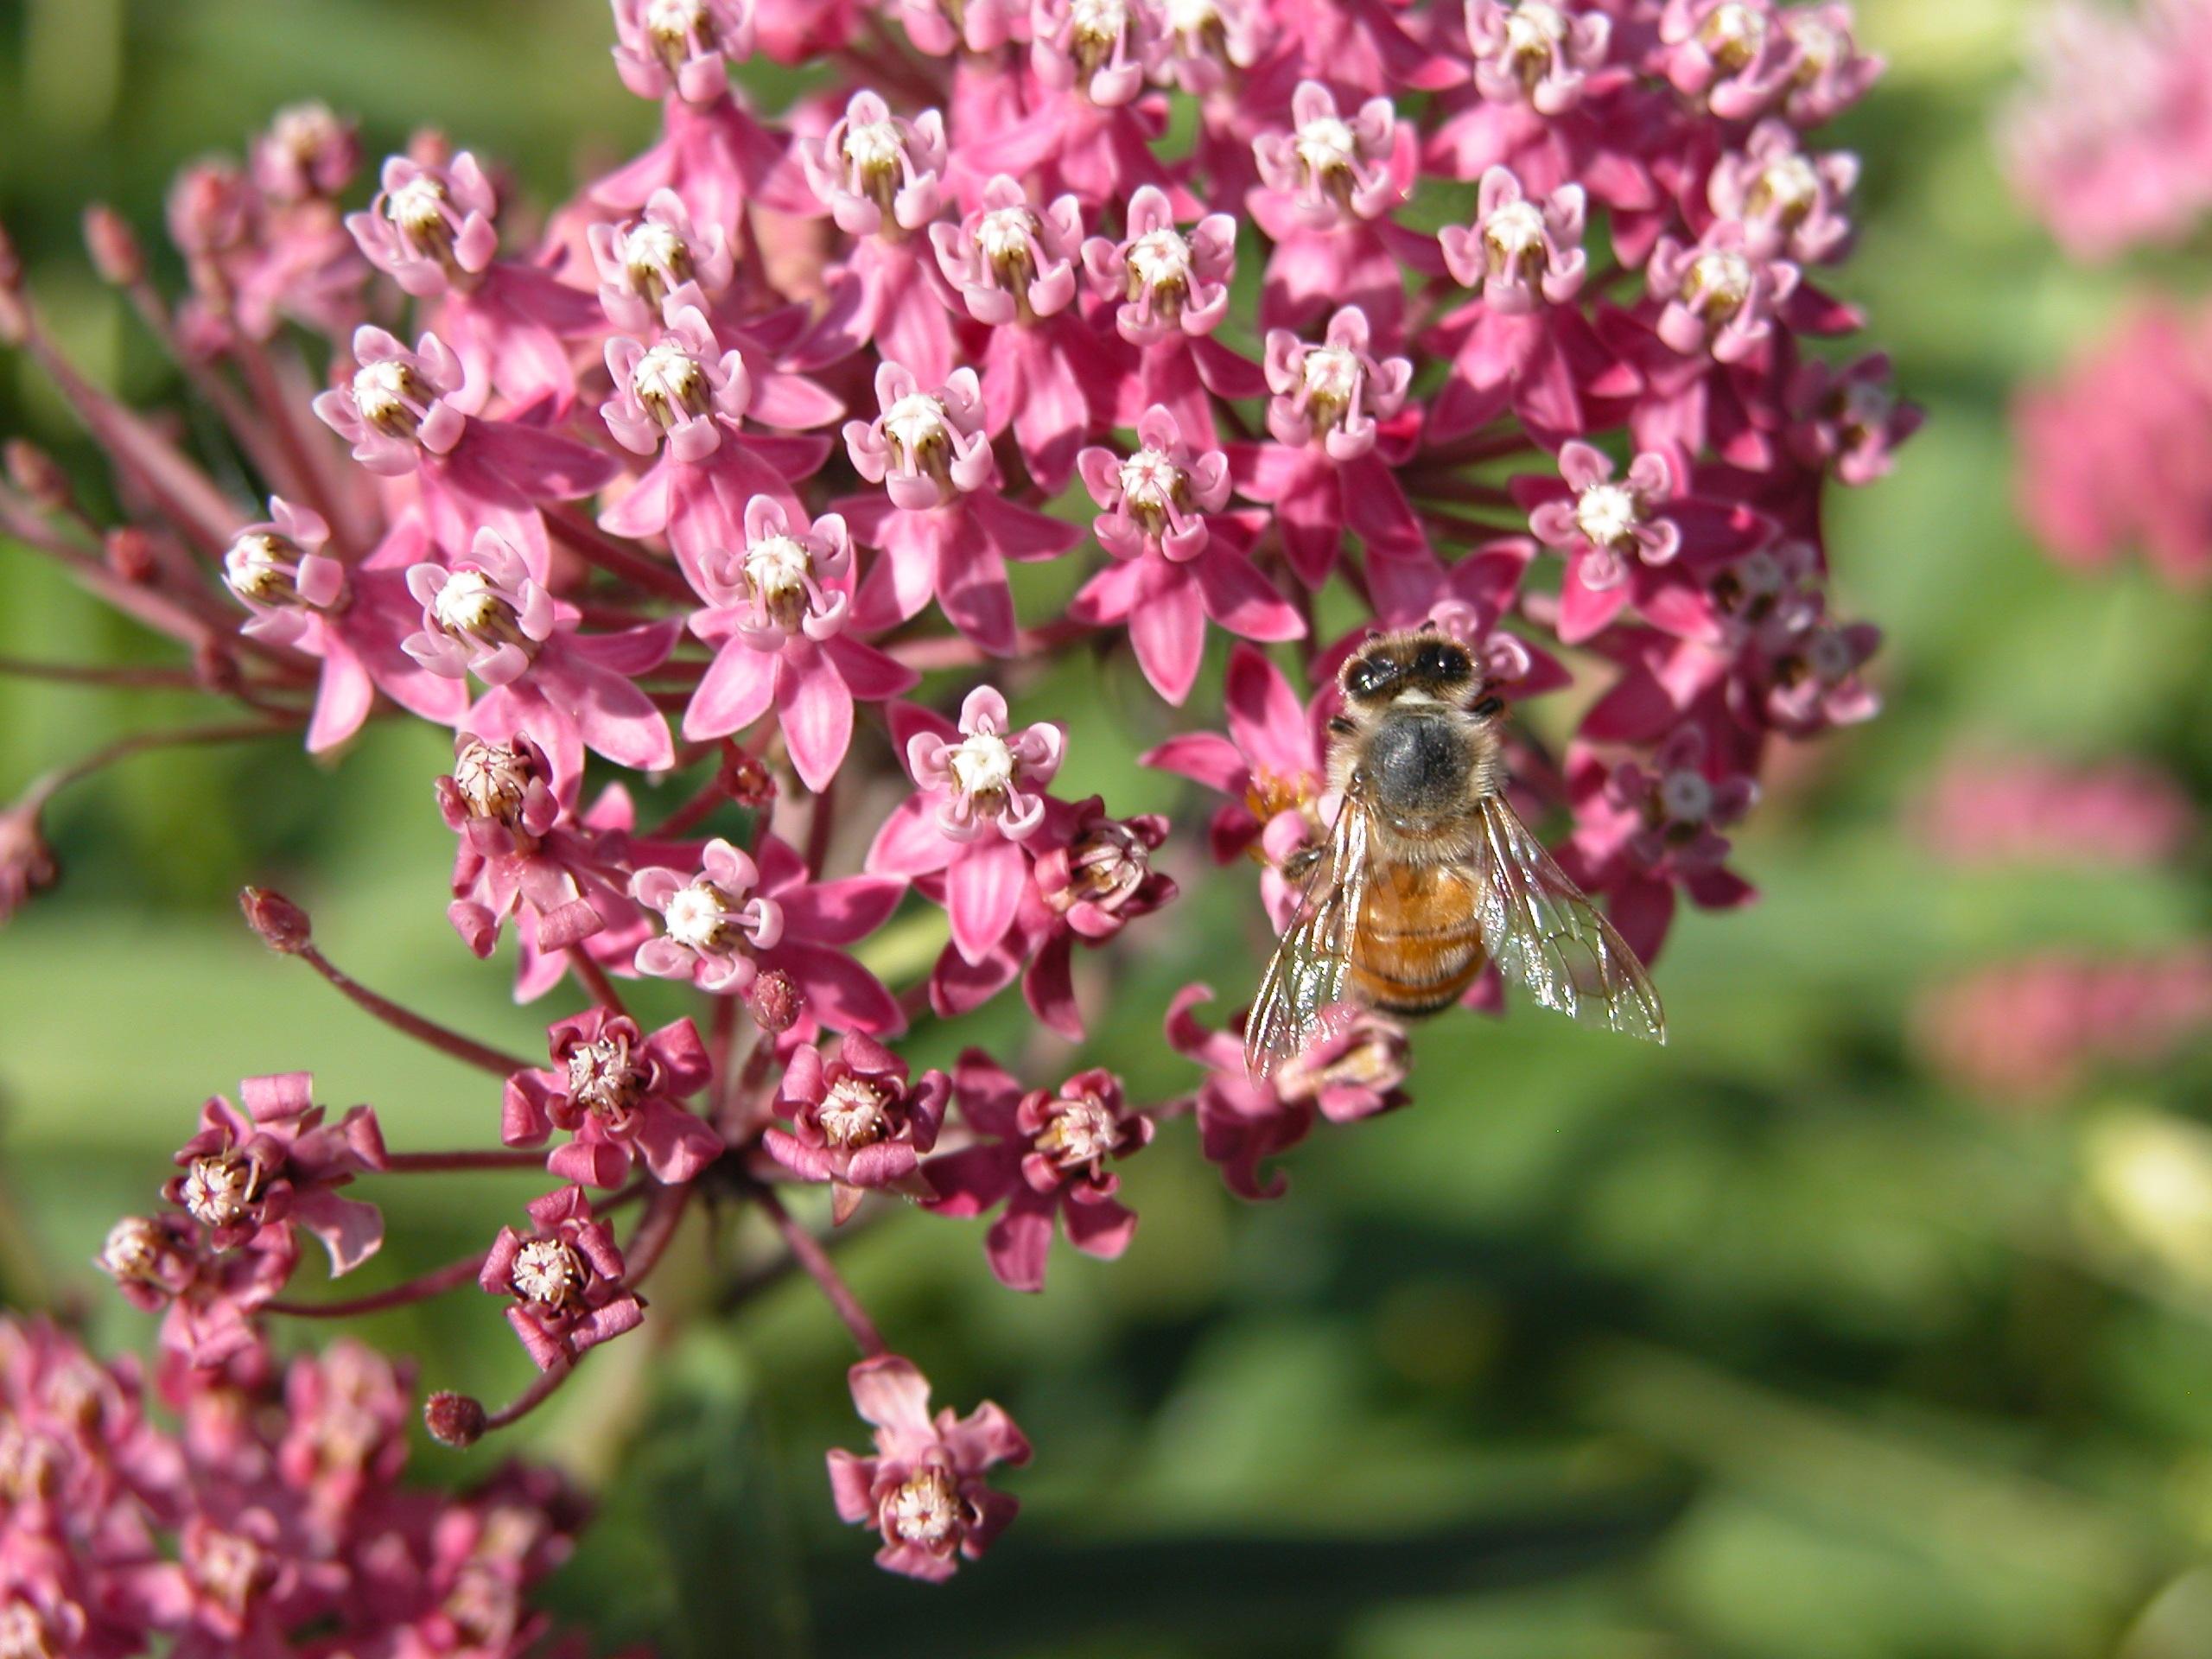 Fotos Gratis Maleza De Pantano Milkweed Rojo Abeja Flor